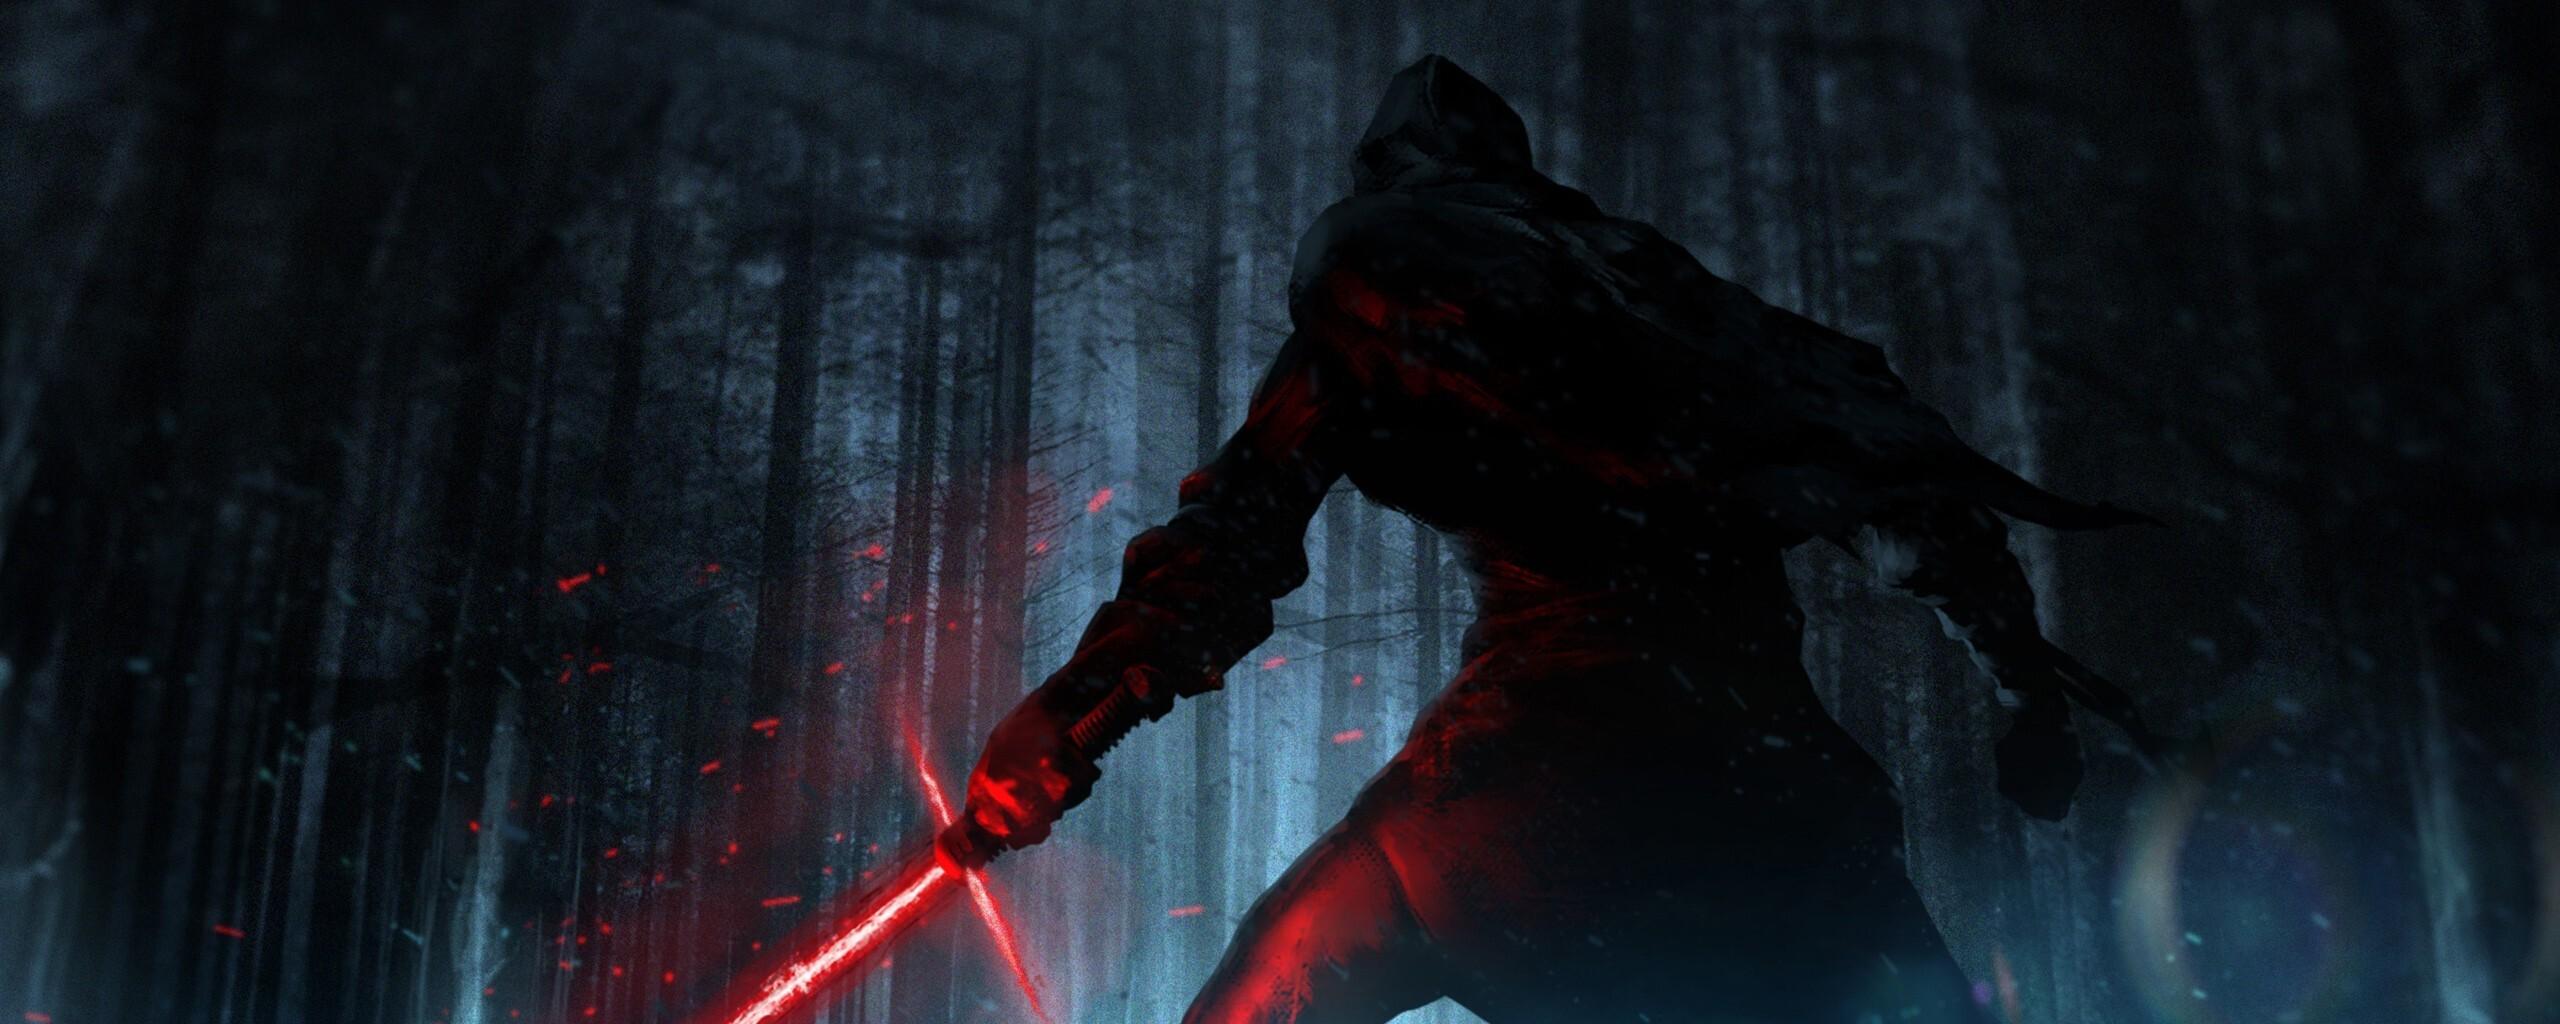 star-wars-ep7-the-force-awakens-2-hd.jpg